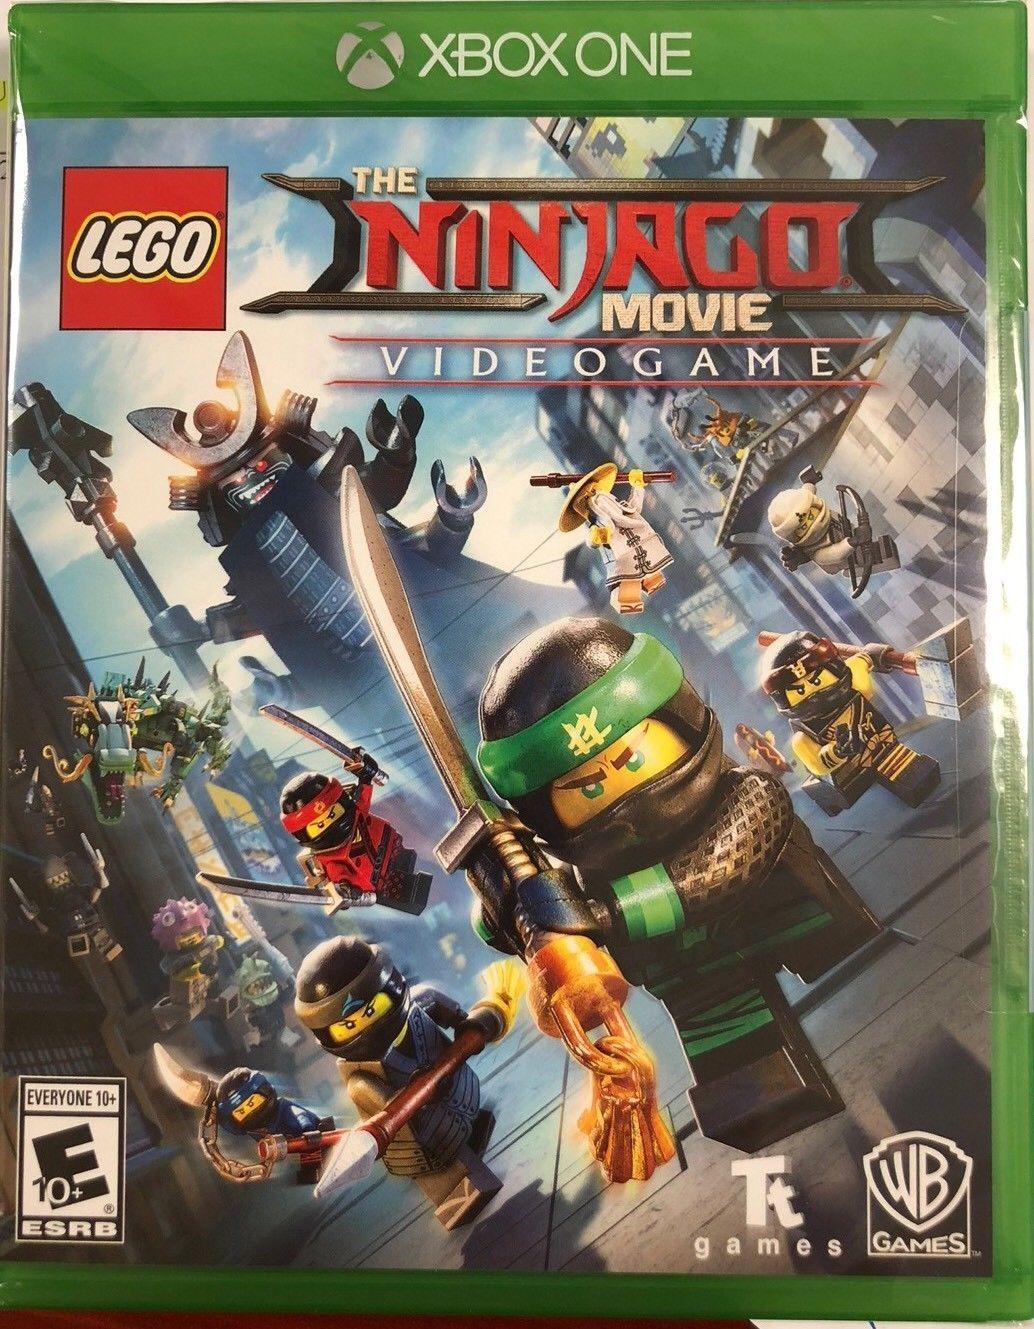 LEGO Ninjago Movie Video Game Xbox One [New]